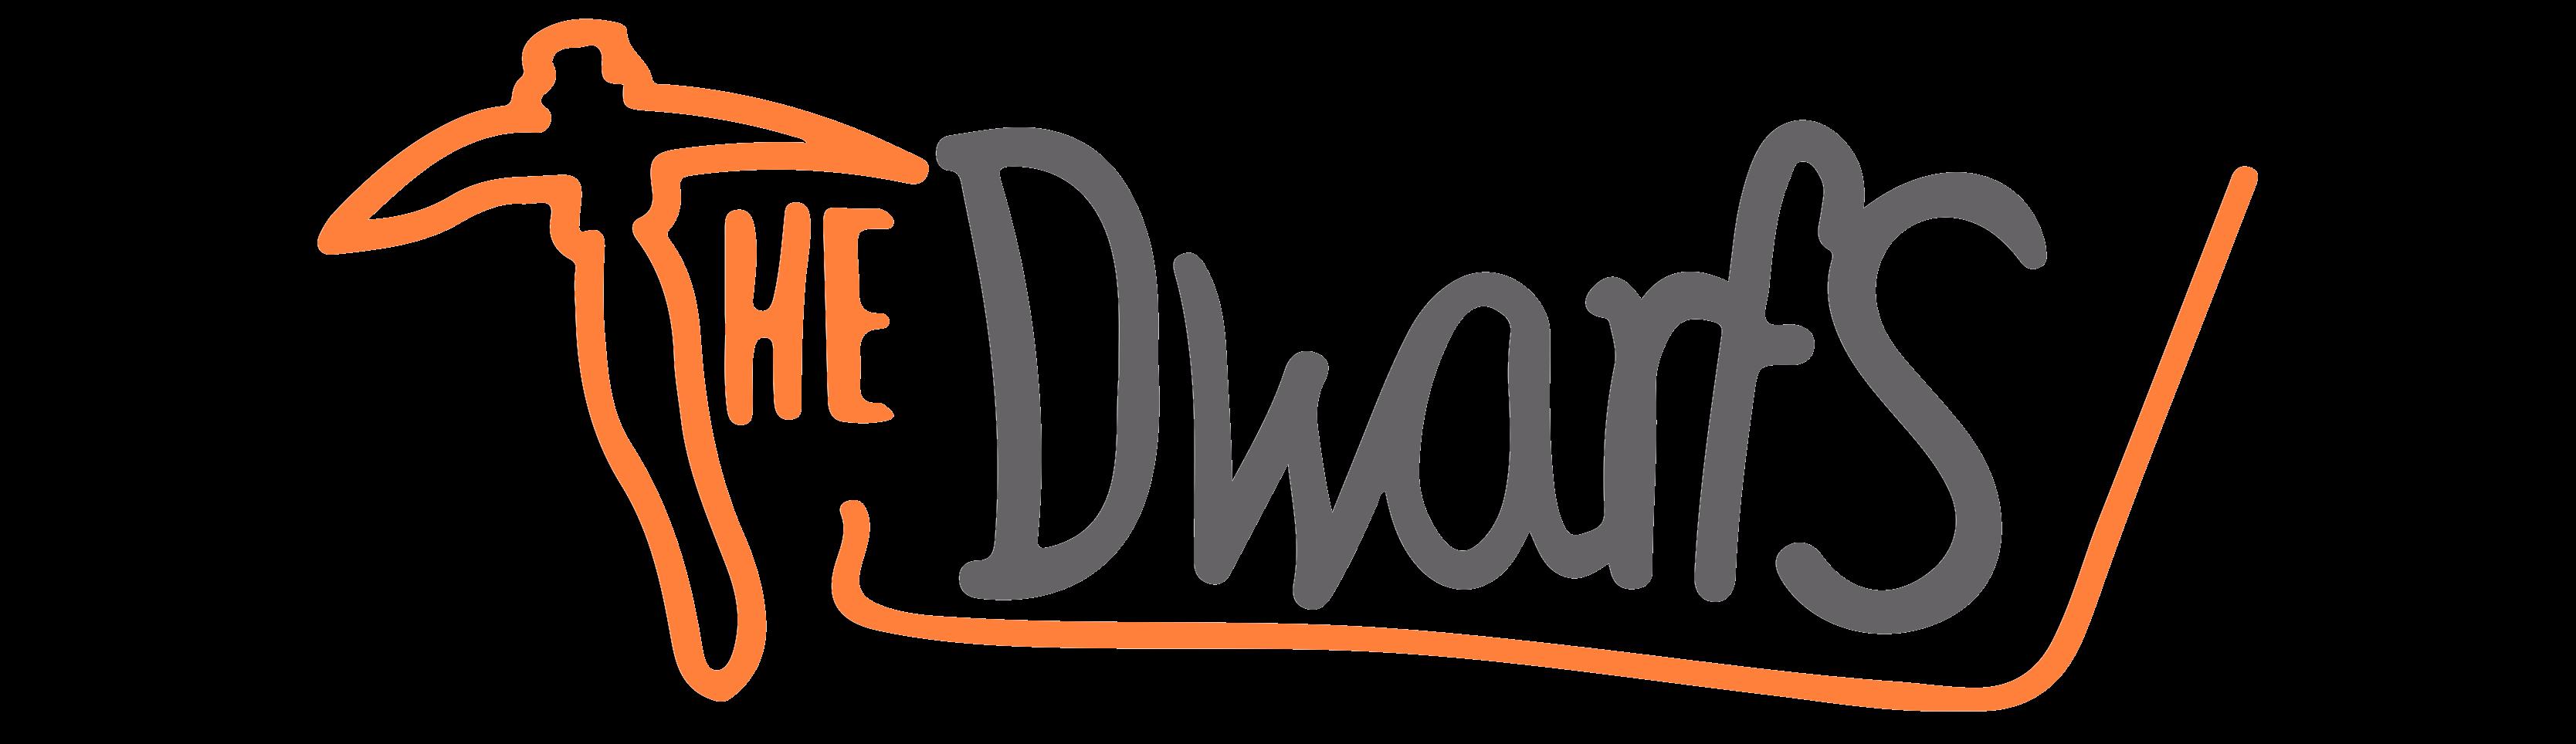 The Dwarfs